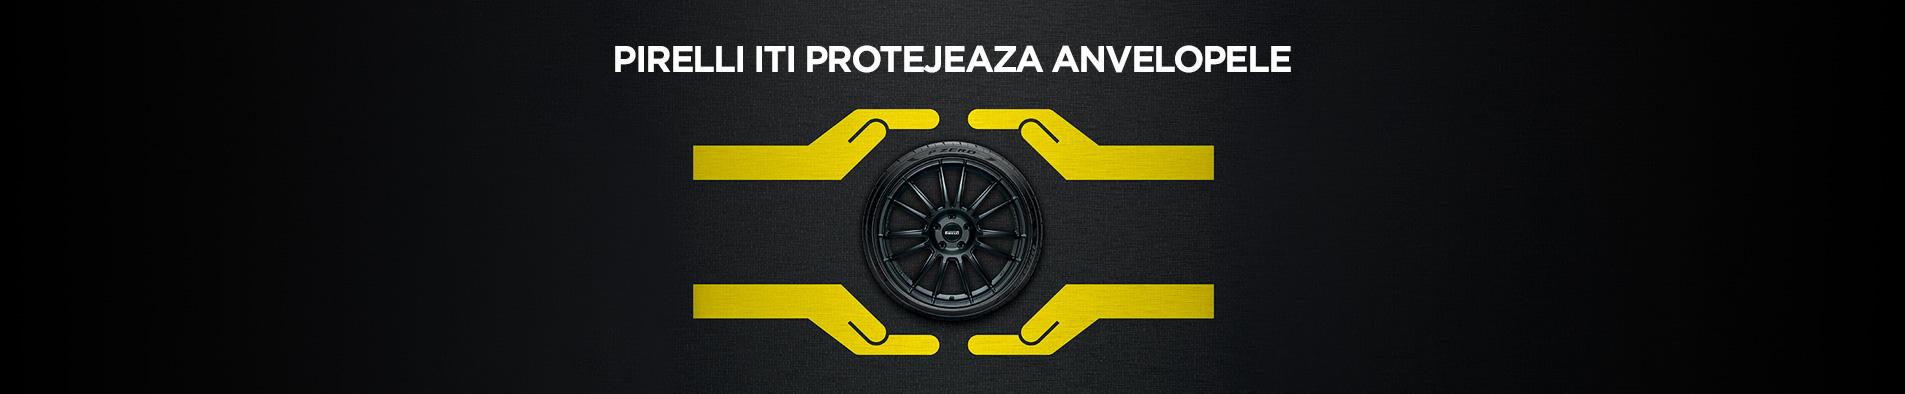 Drum bun! Pirelli iţi protejeazâ anvelopele